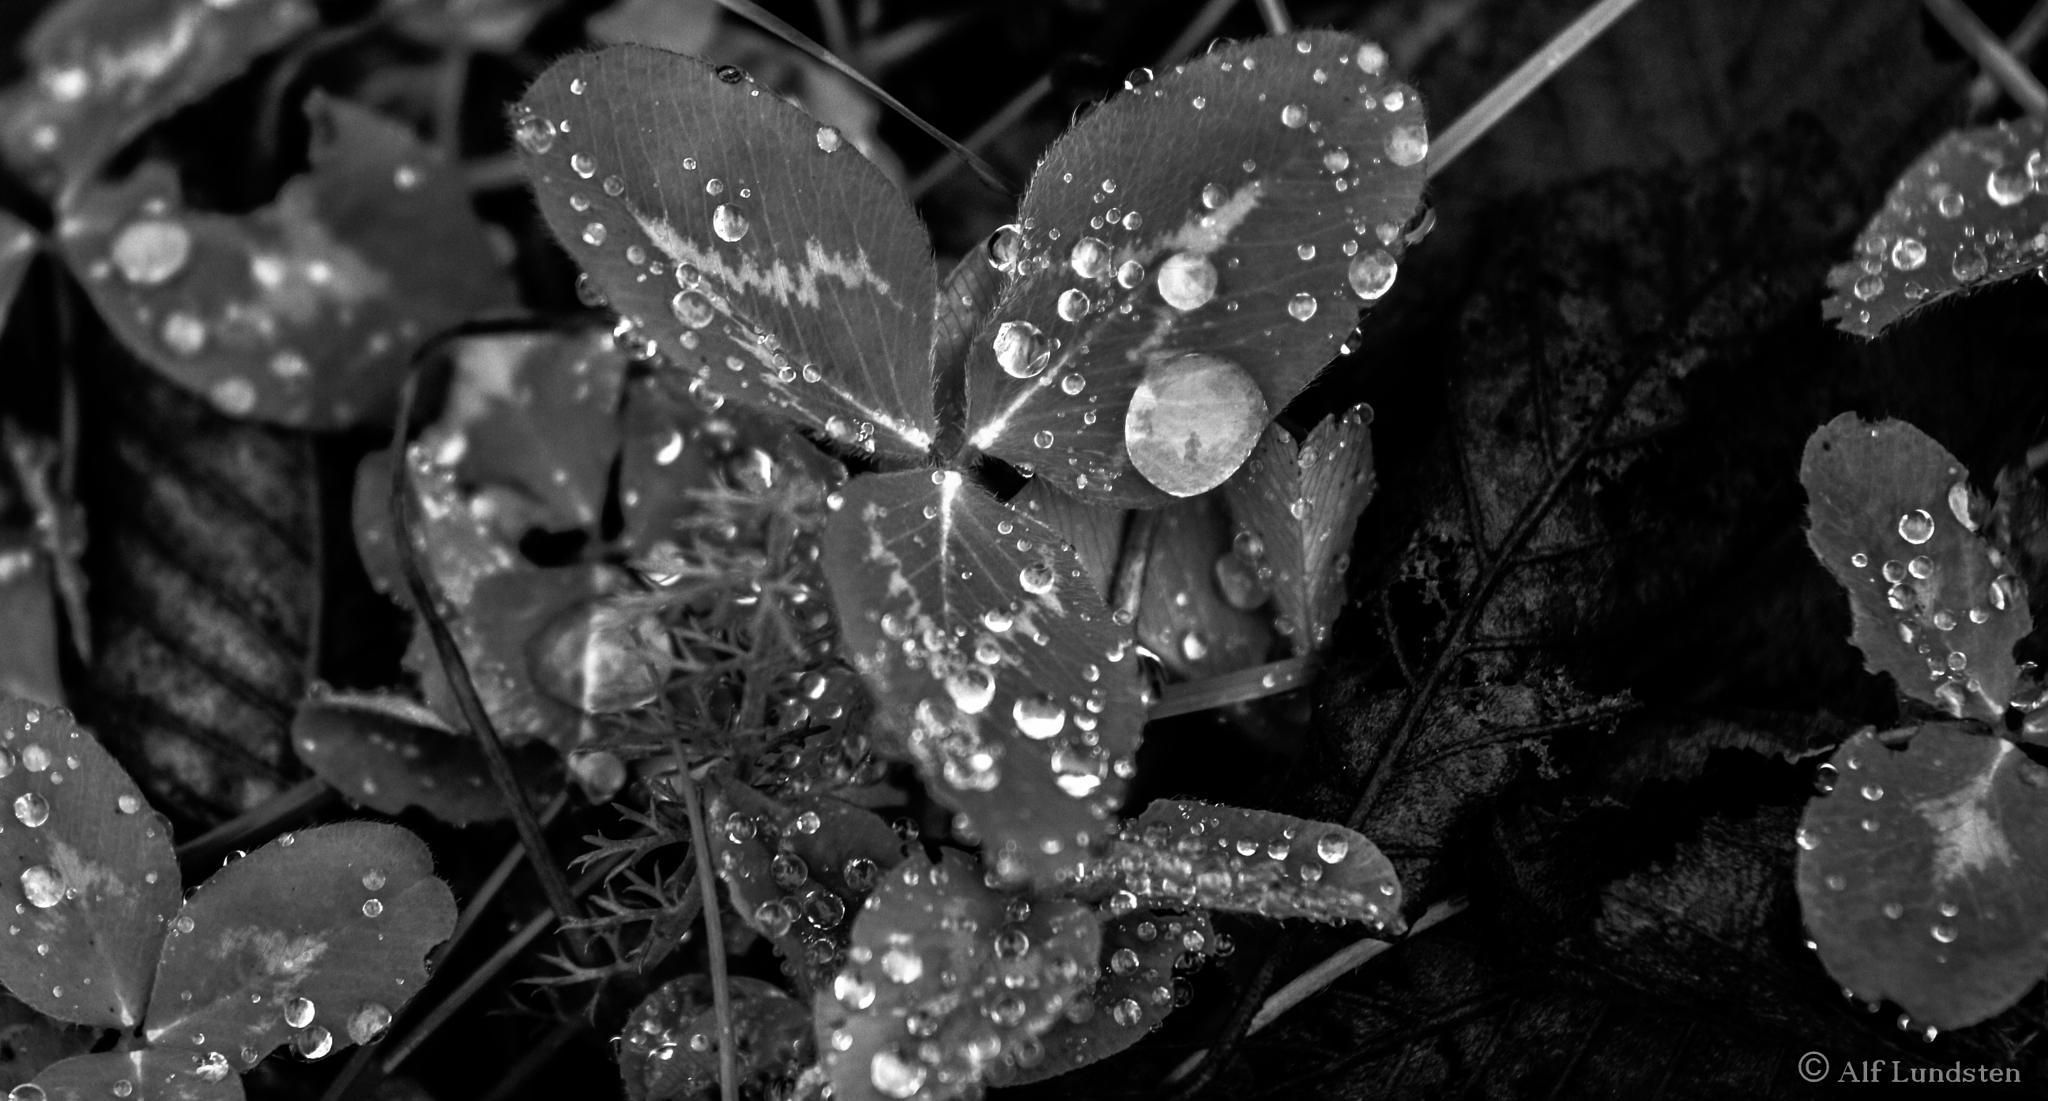 Singing in the rain by alf lundsten